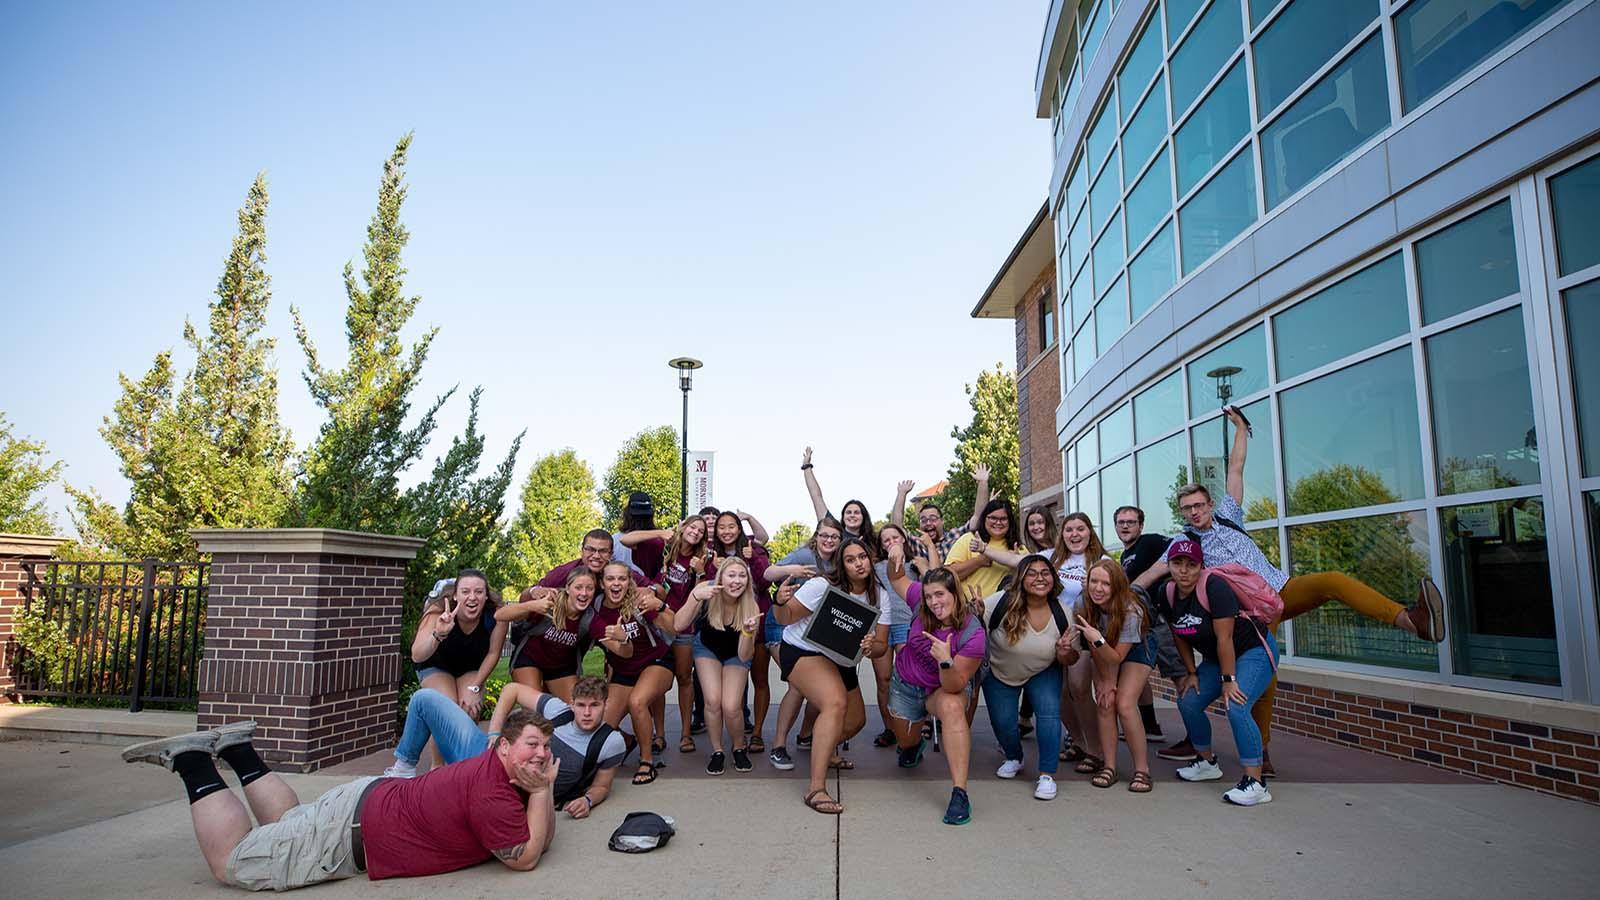 Woo Crew members strike a fun pose during Morningside's 2021 orientation